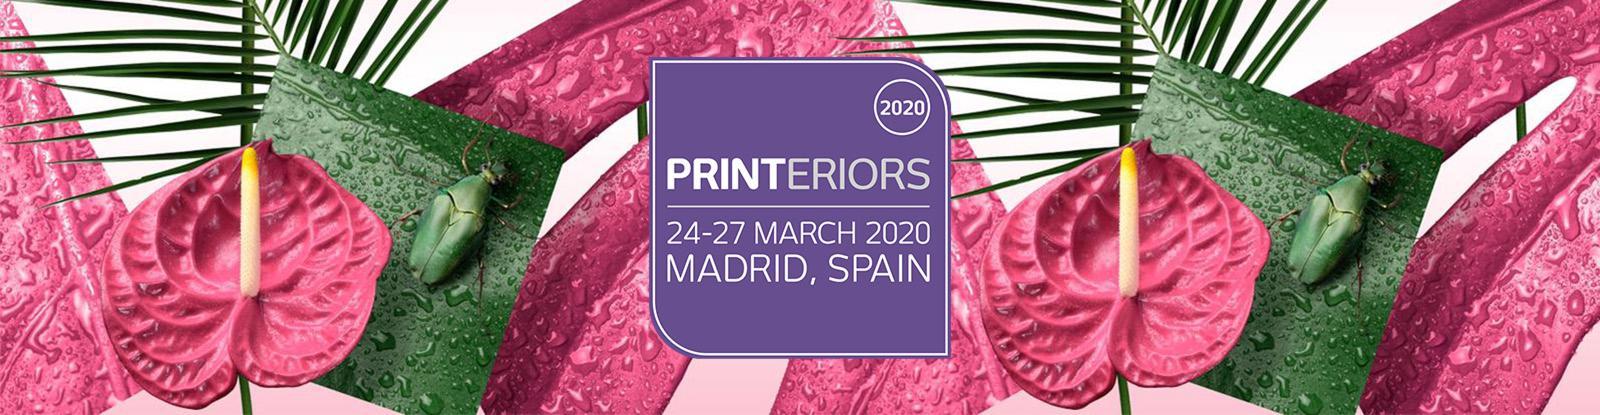 Printeriors-ASP-Banner